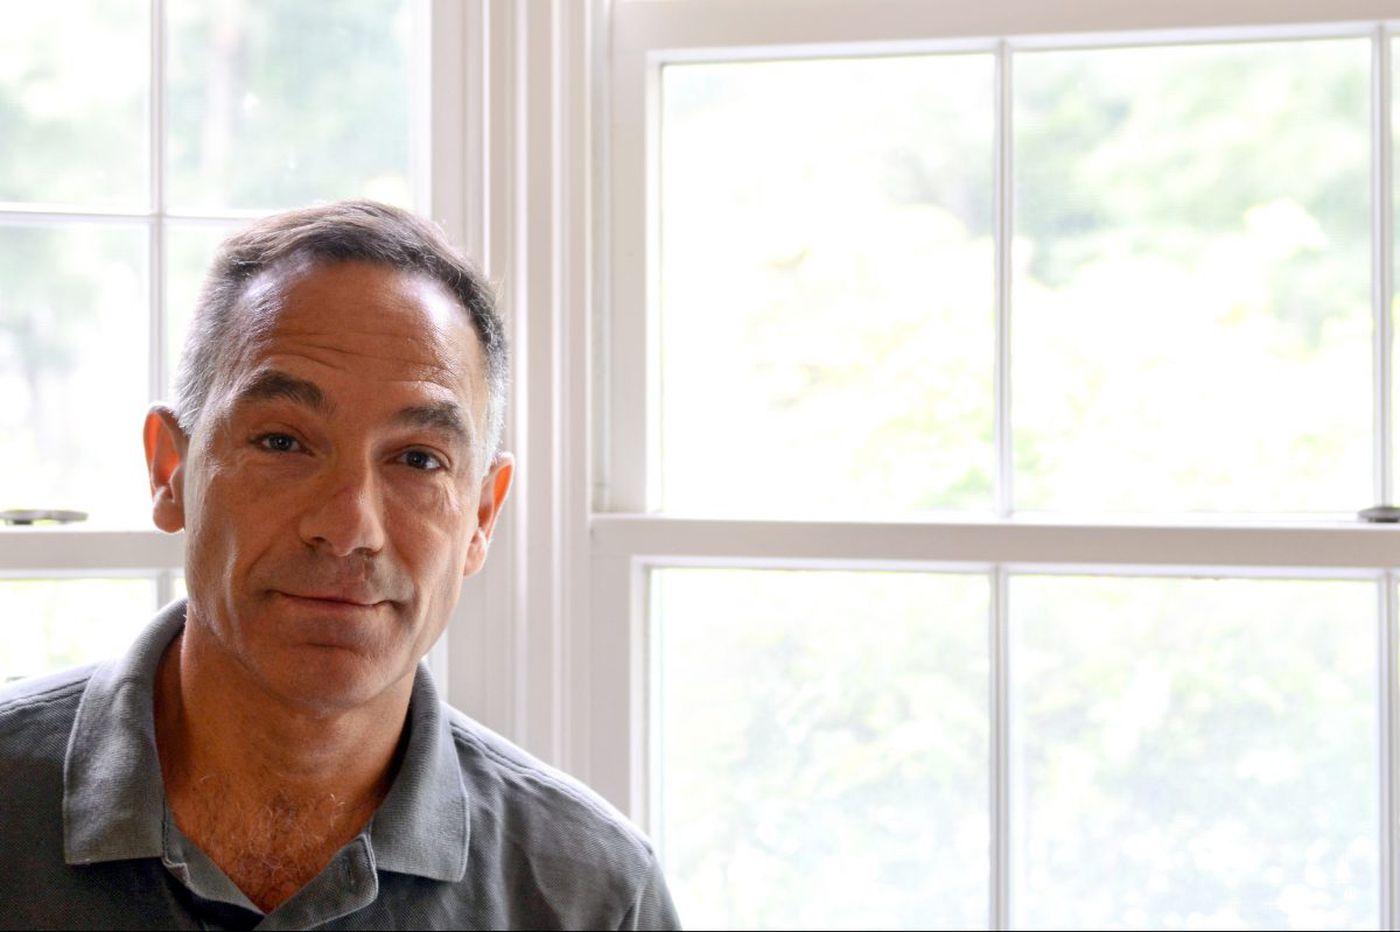 Vanguard whistleblower David Danon tells court how he warned the company on its taxes